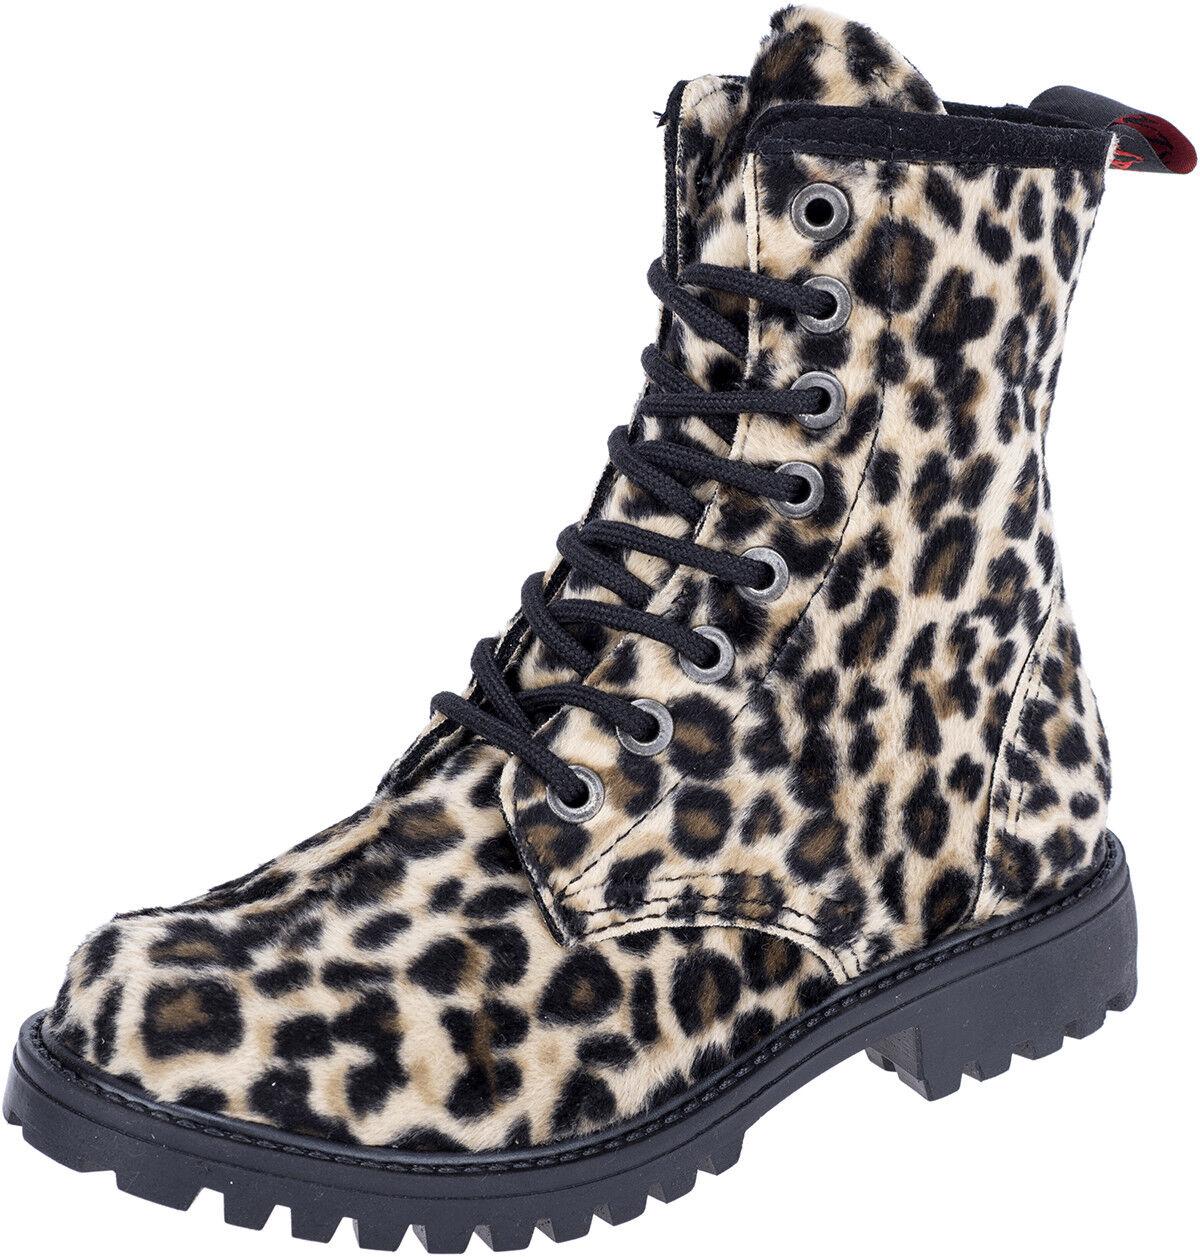 Aderlass FAKE FUR 8-Eye LEOPARD Stiefel STIEFEL Schuhe Rockabilly